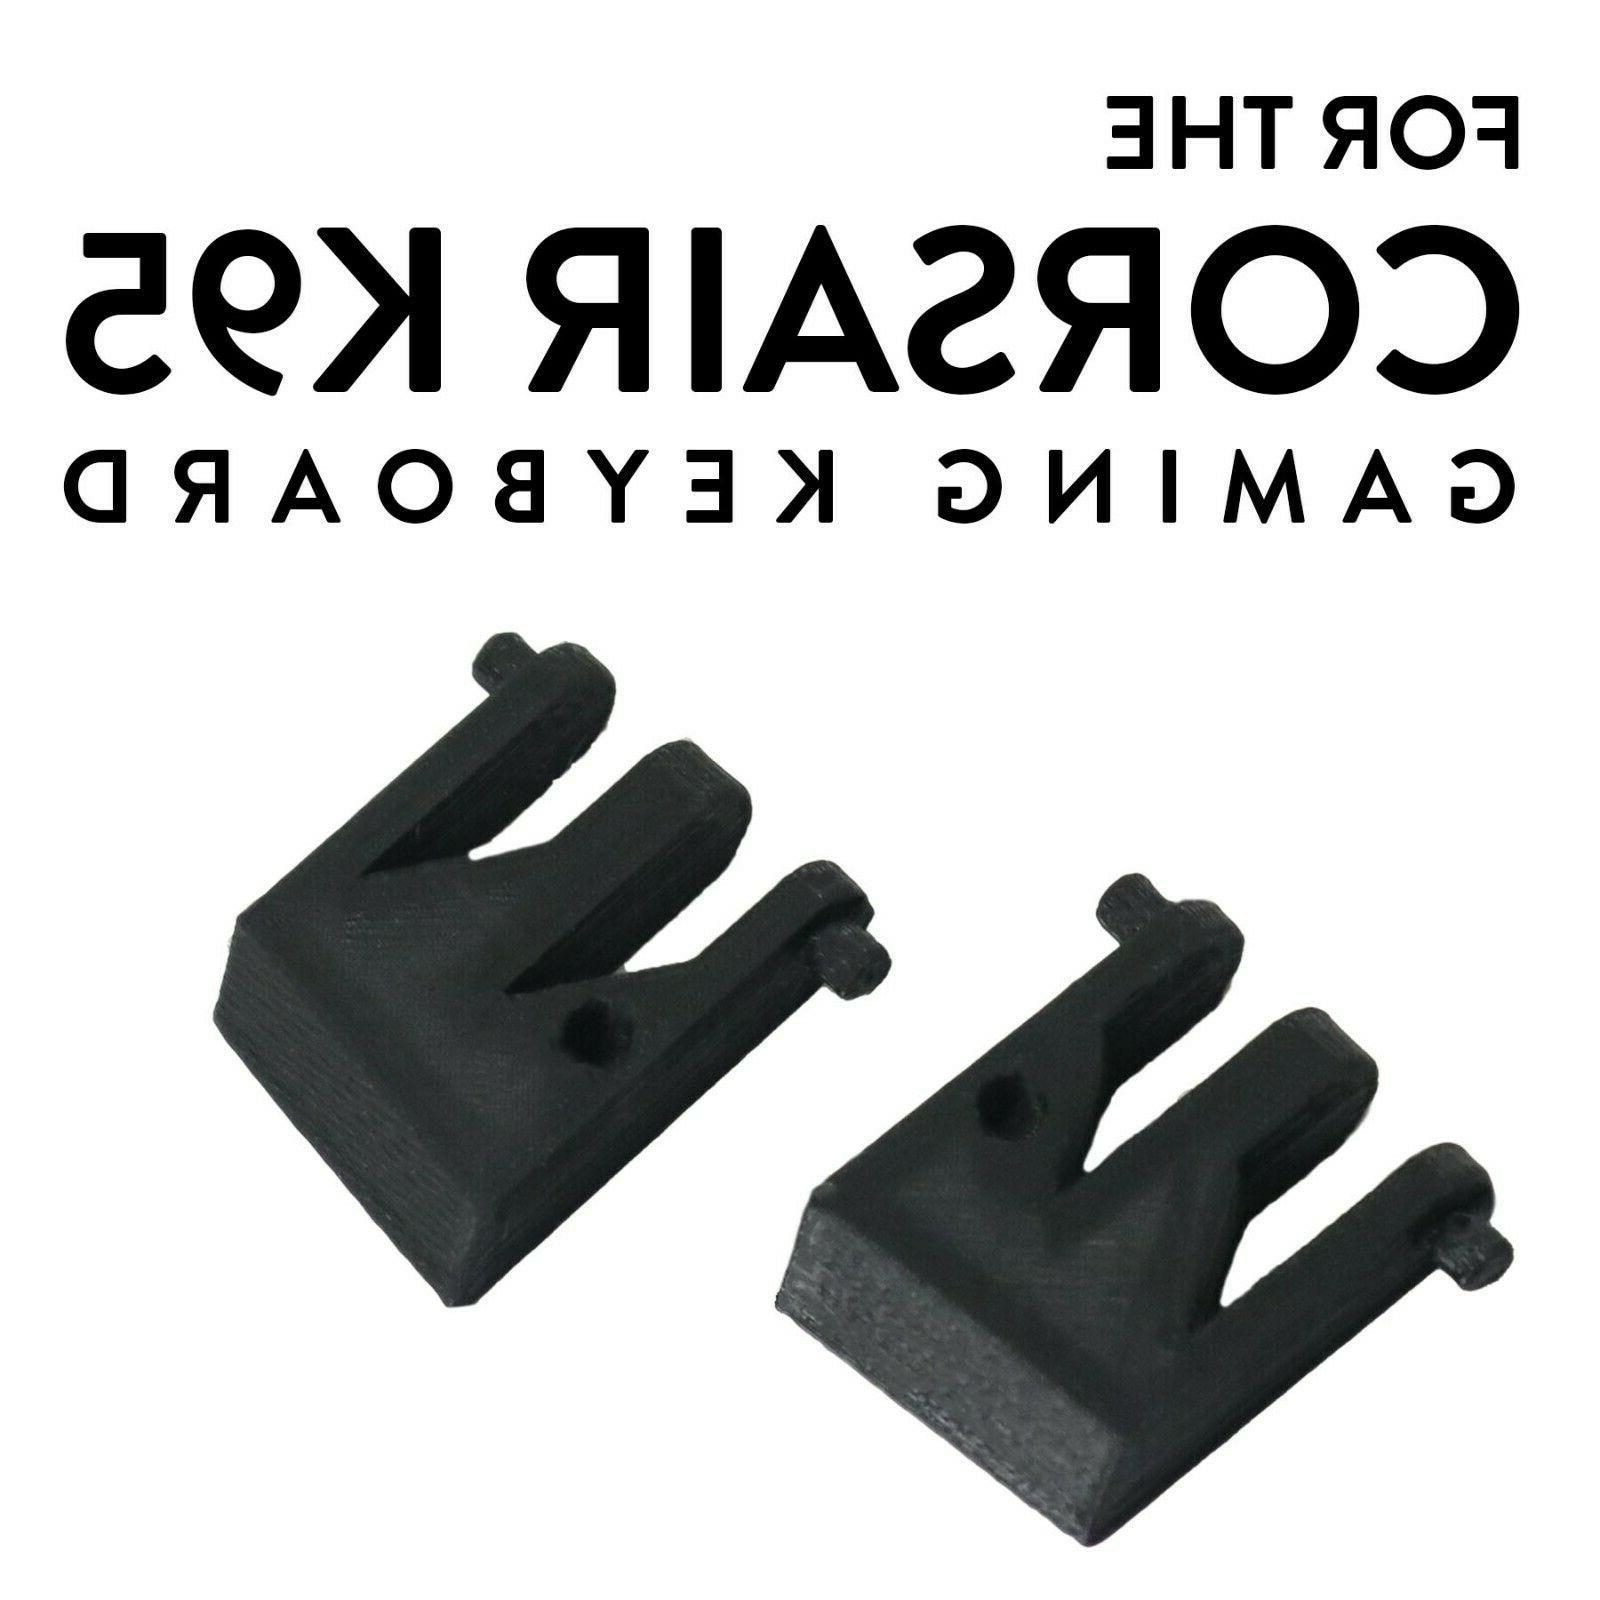 2pcs k95 platinum keyboard feet foot replacement